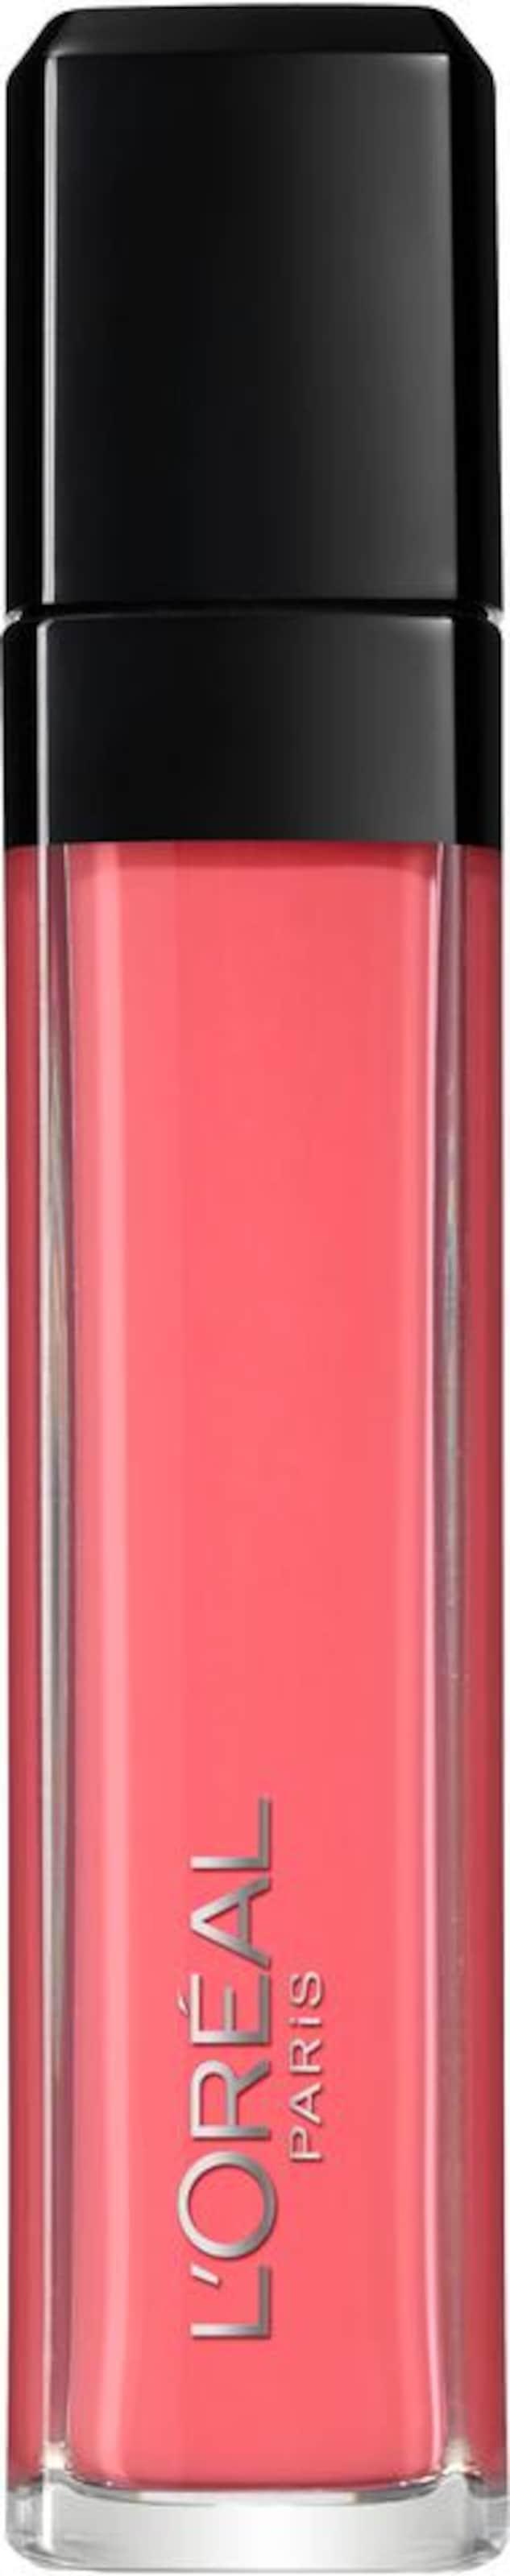 Gloss Pink In Paris Cream'Lippenstift L'oréal 'infaillible jUVLSpMGqz